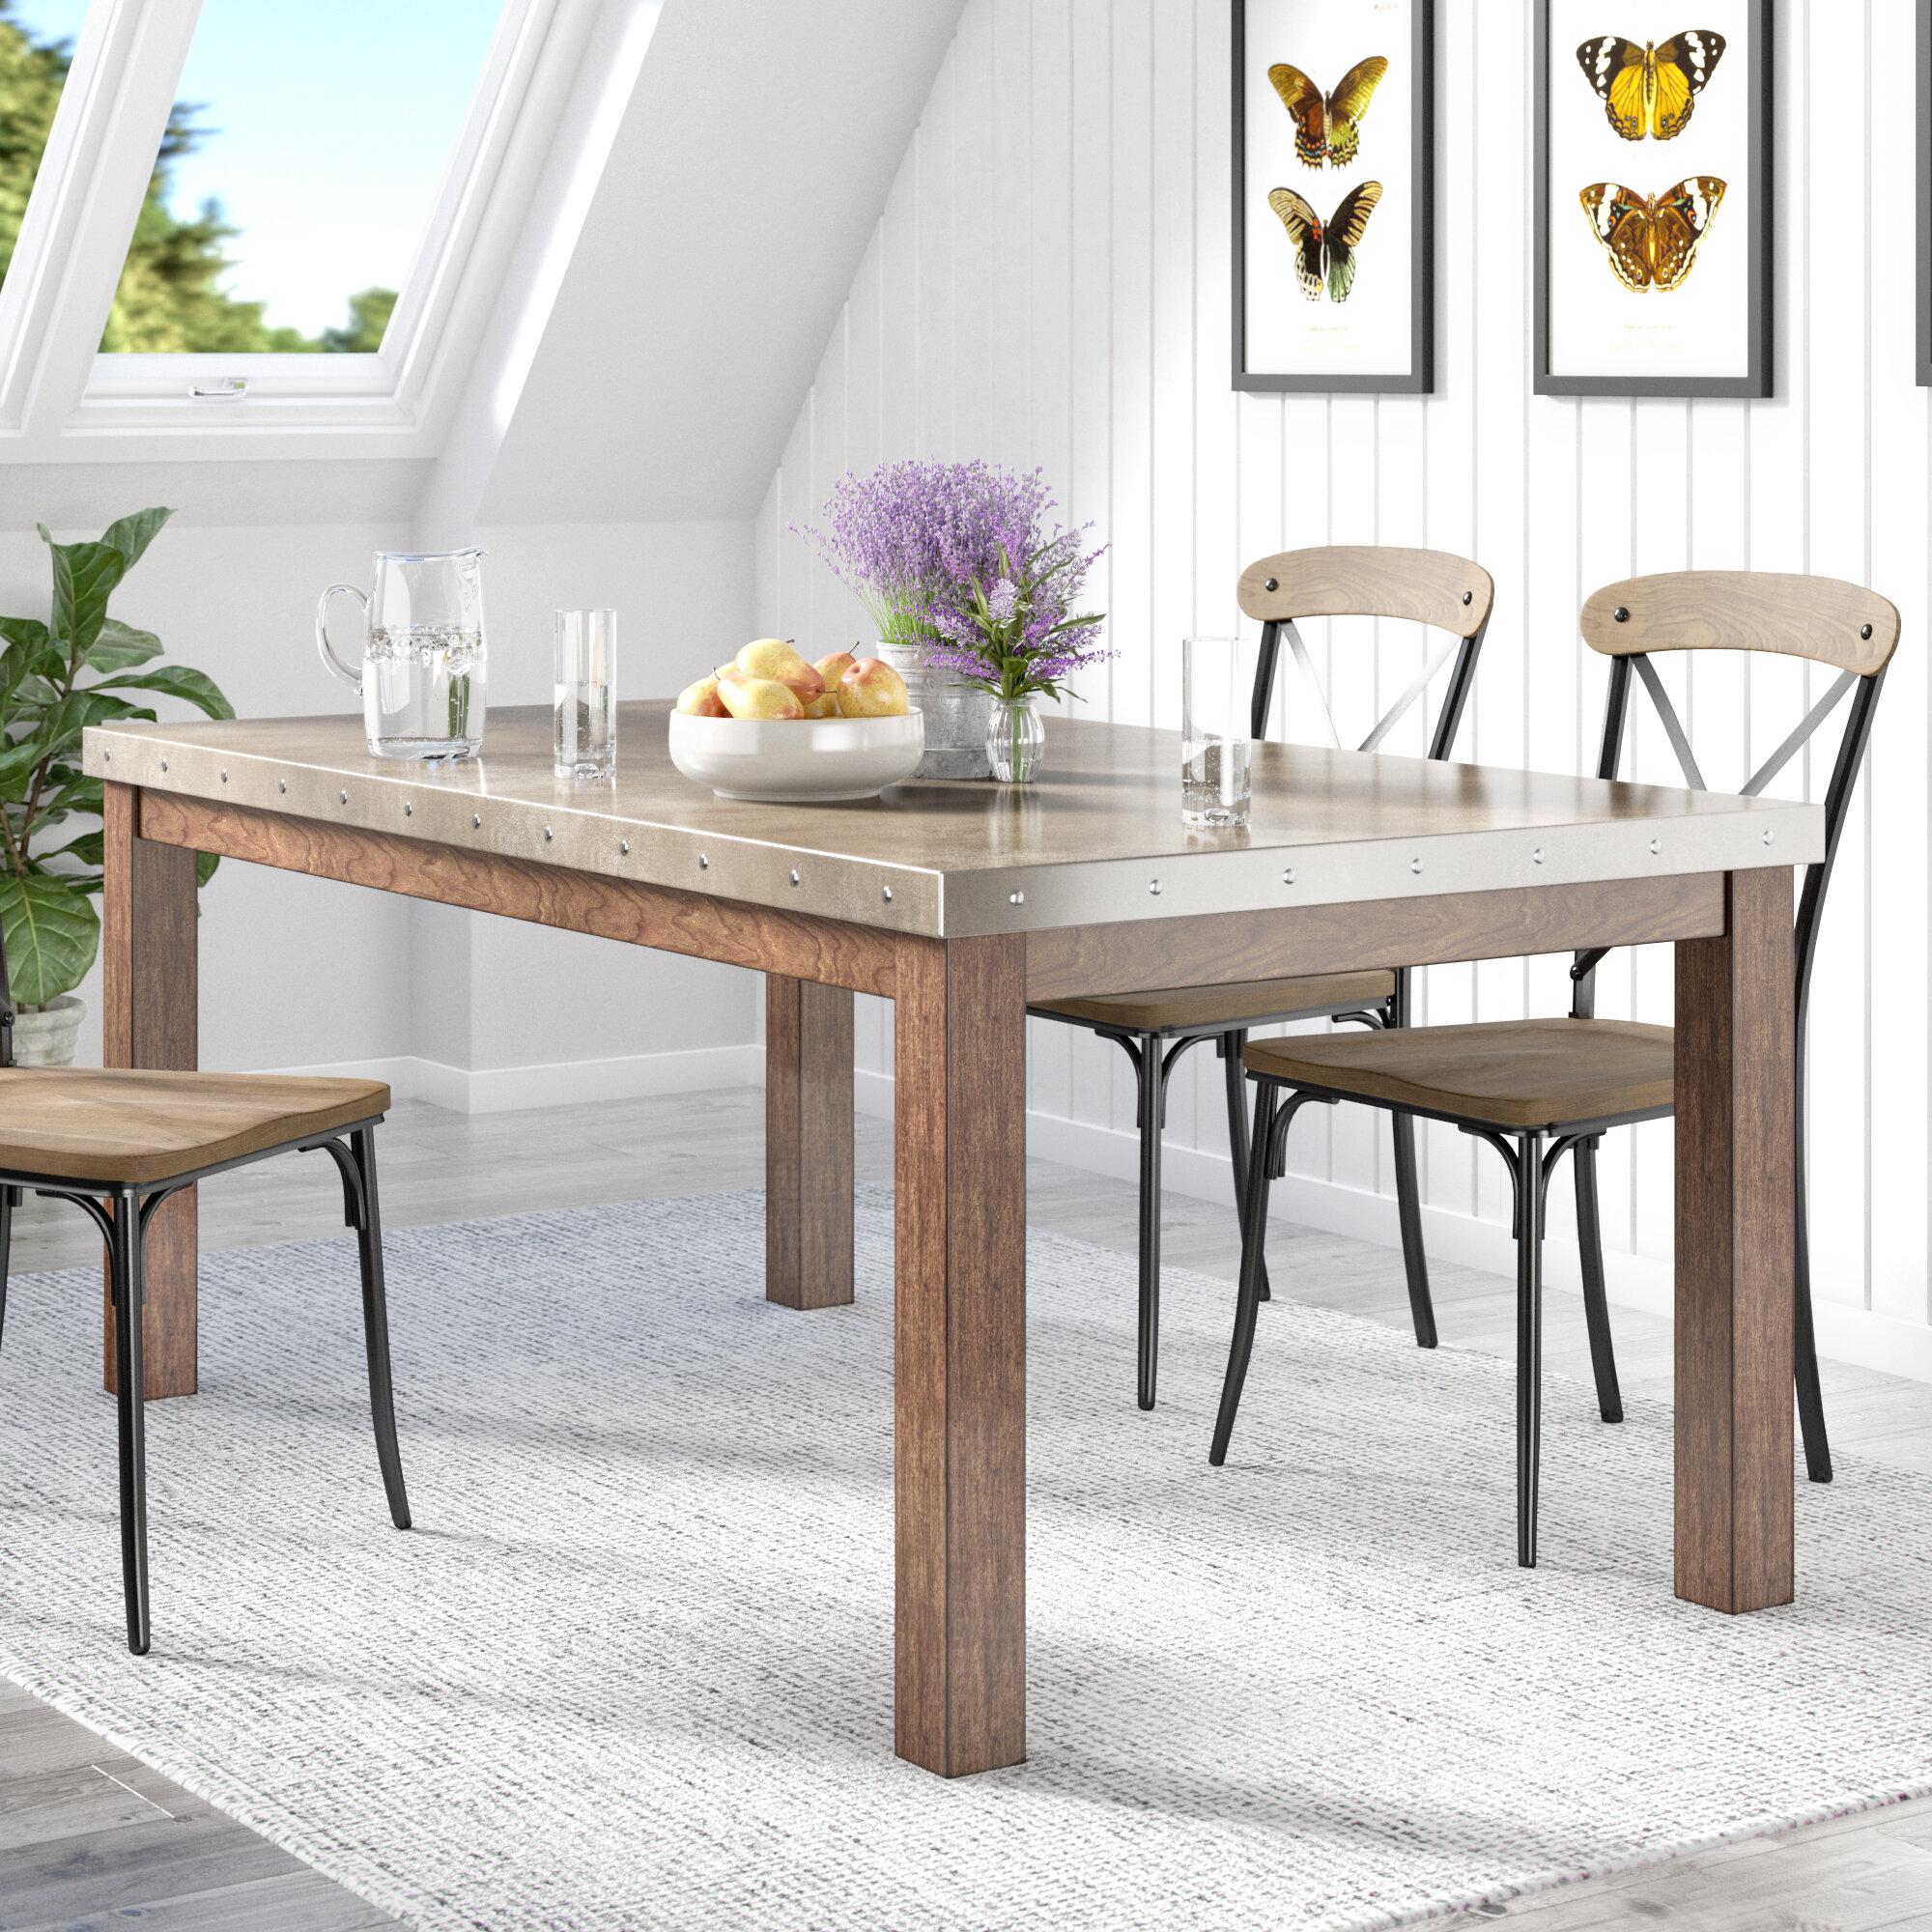 Lark Manor Stainless Steel Top Dining Table & Reviews | Wayfair